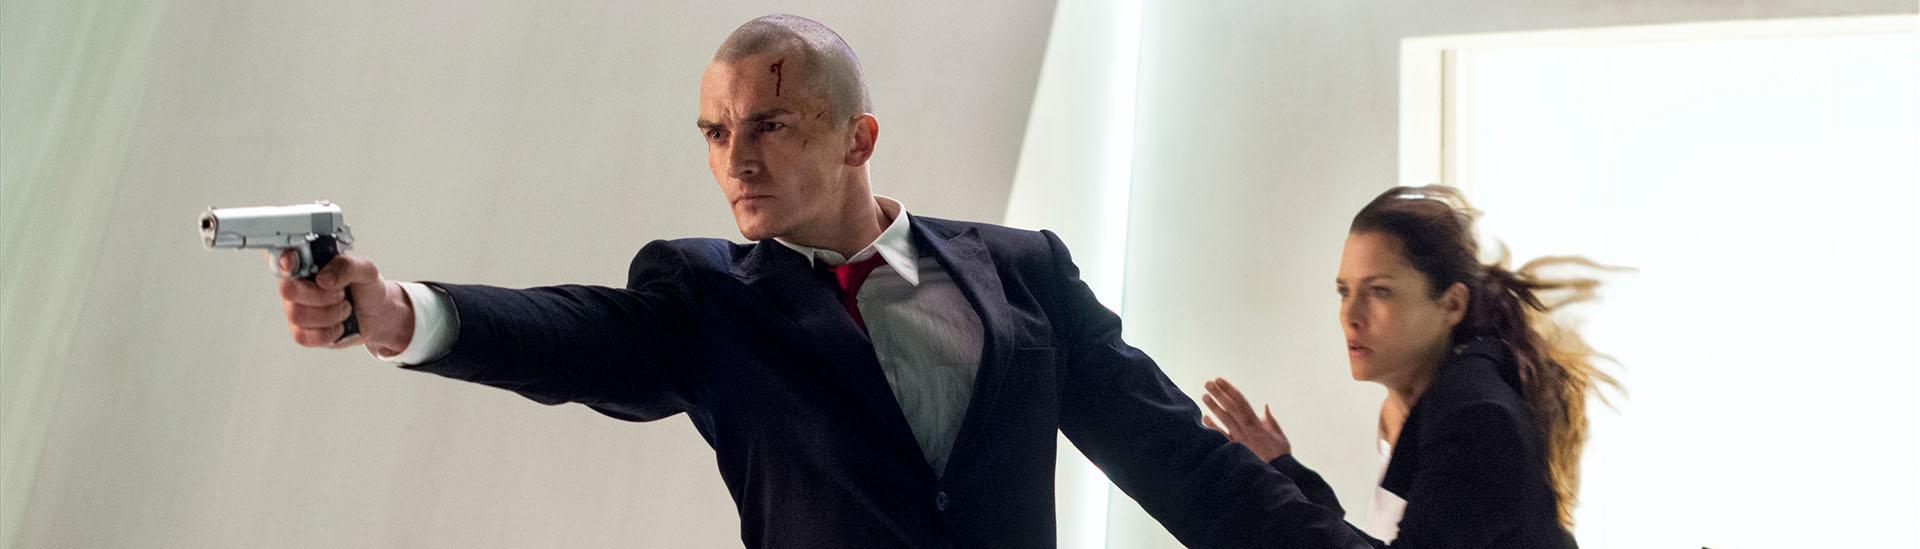 Baner filmu 'Hitman: Agent 47'